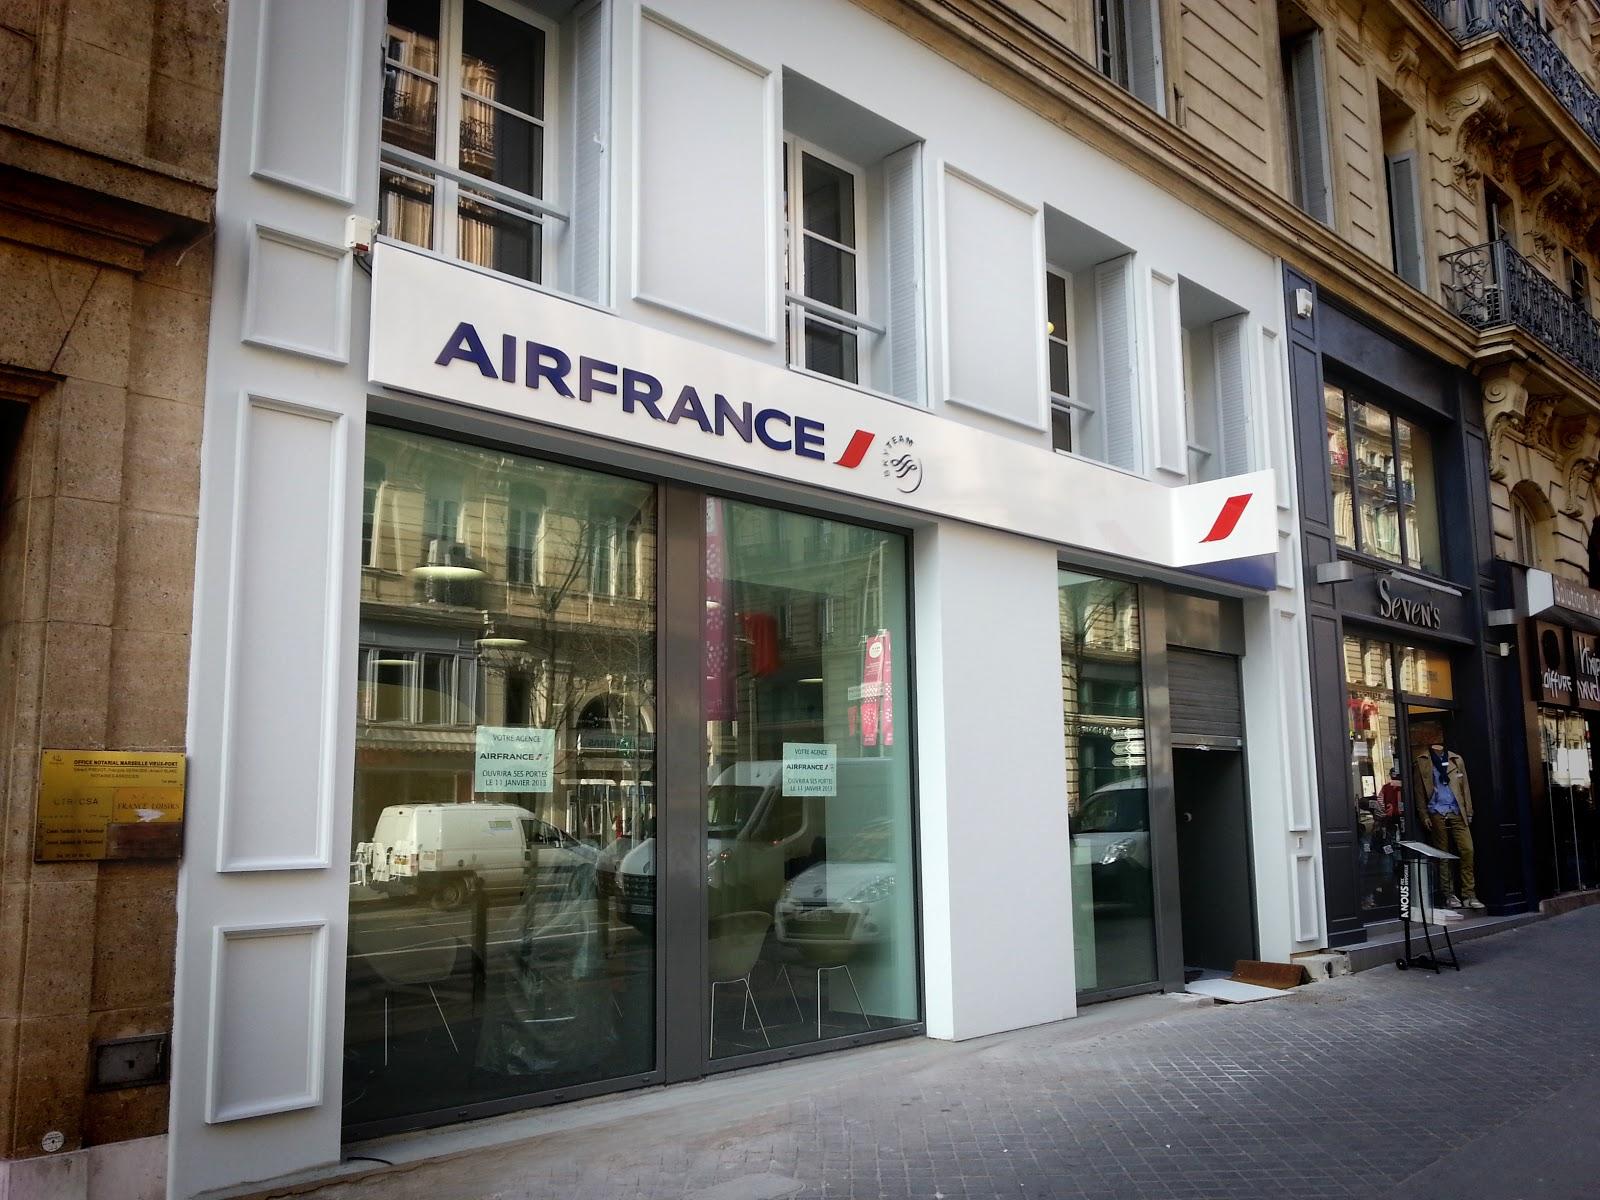 D U00e9sabuzz U00e9  L U0026 39 Agence D U0026 39 Air France Marseille D U00e9m U00e9nage Au 3  Rue De La R U00e9publique